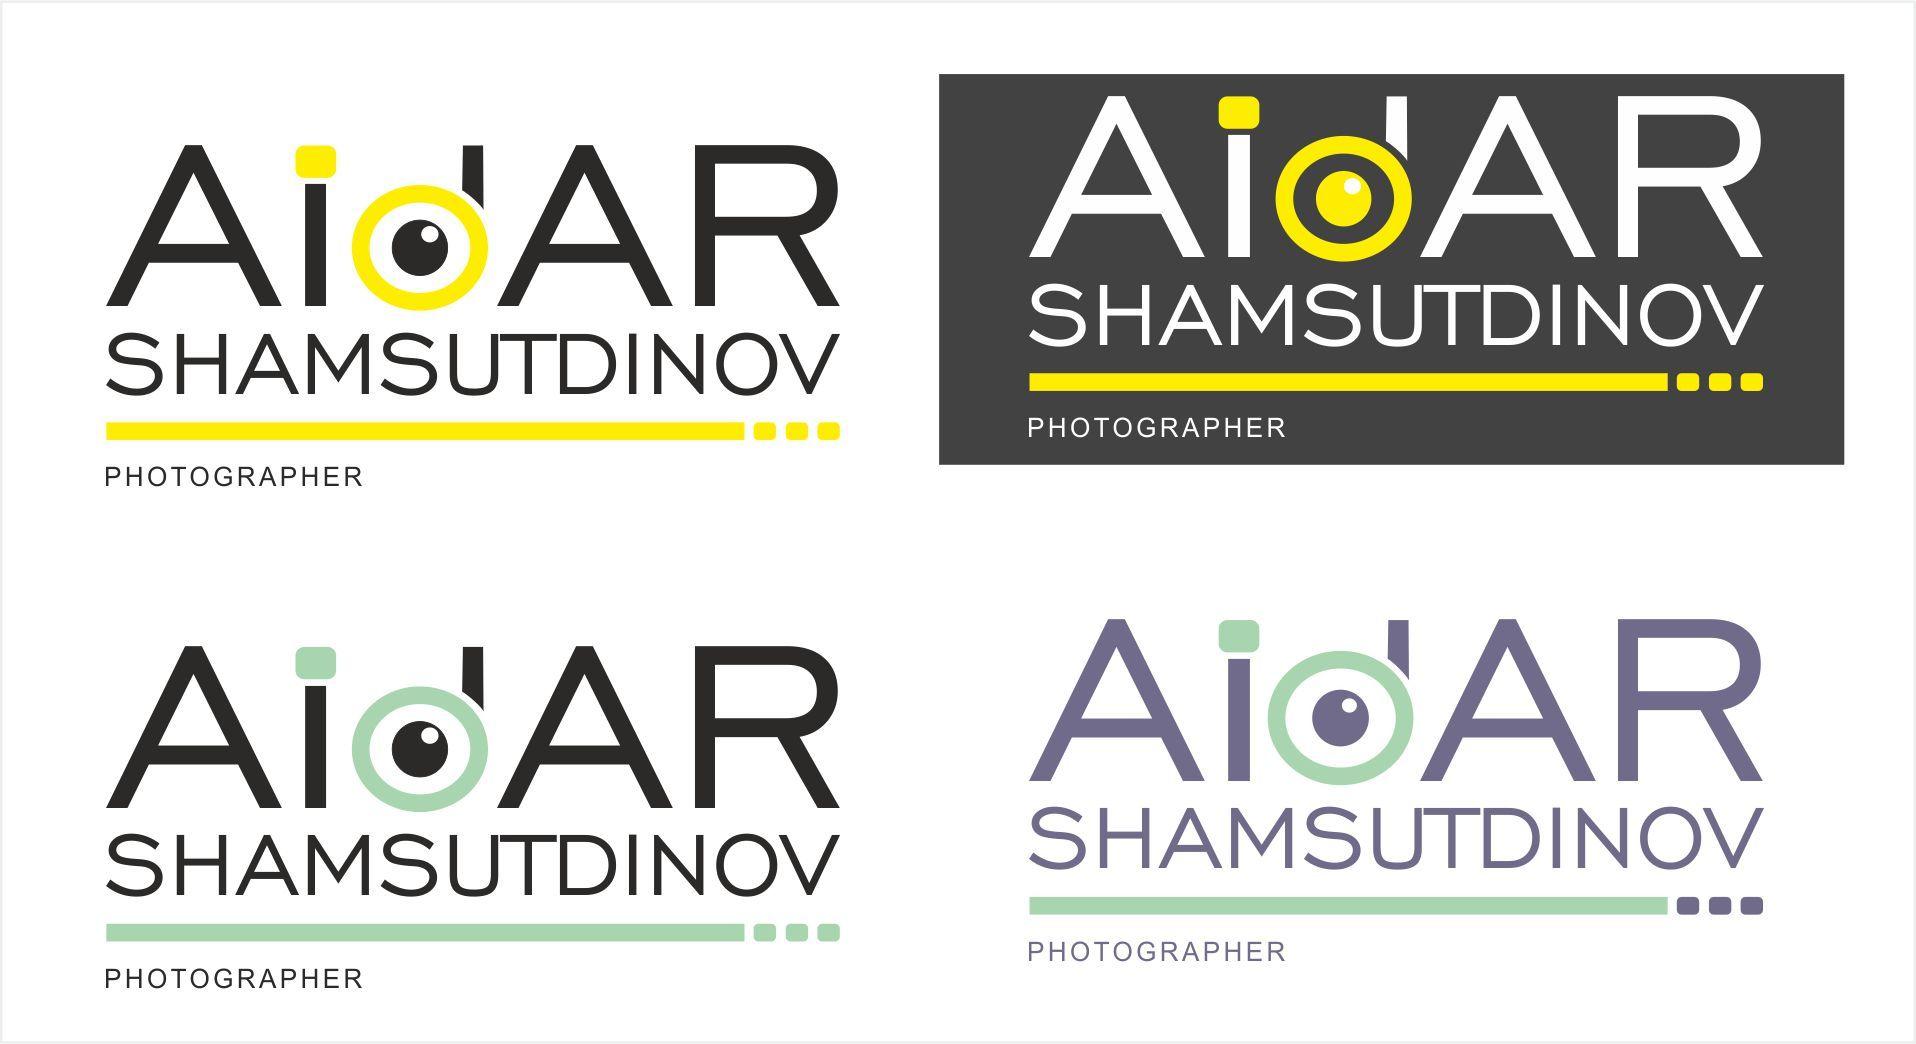 Логотип для фотографа - дизайнер veraQ